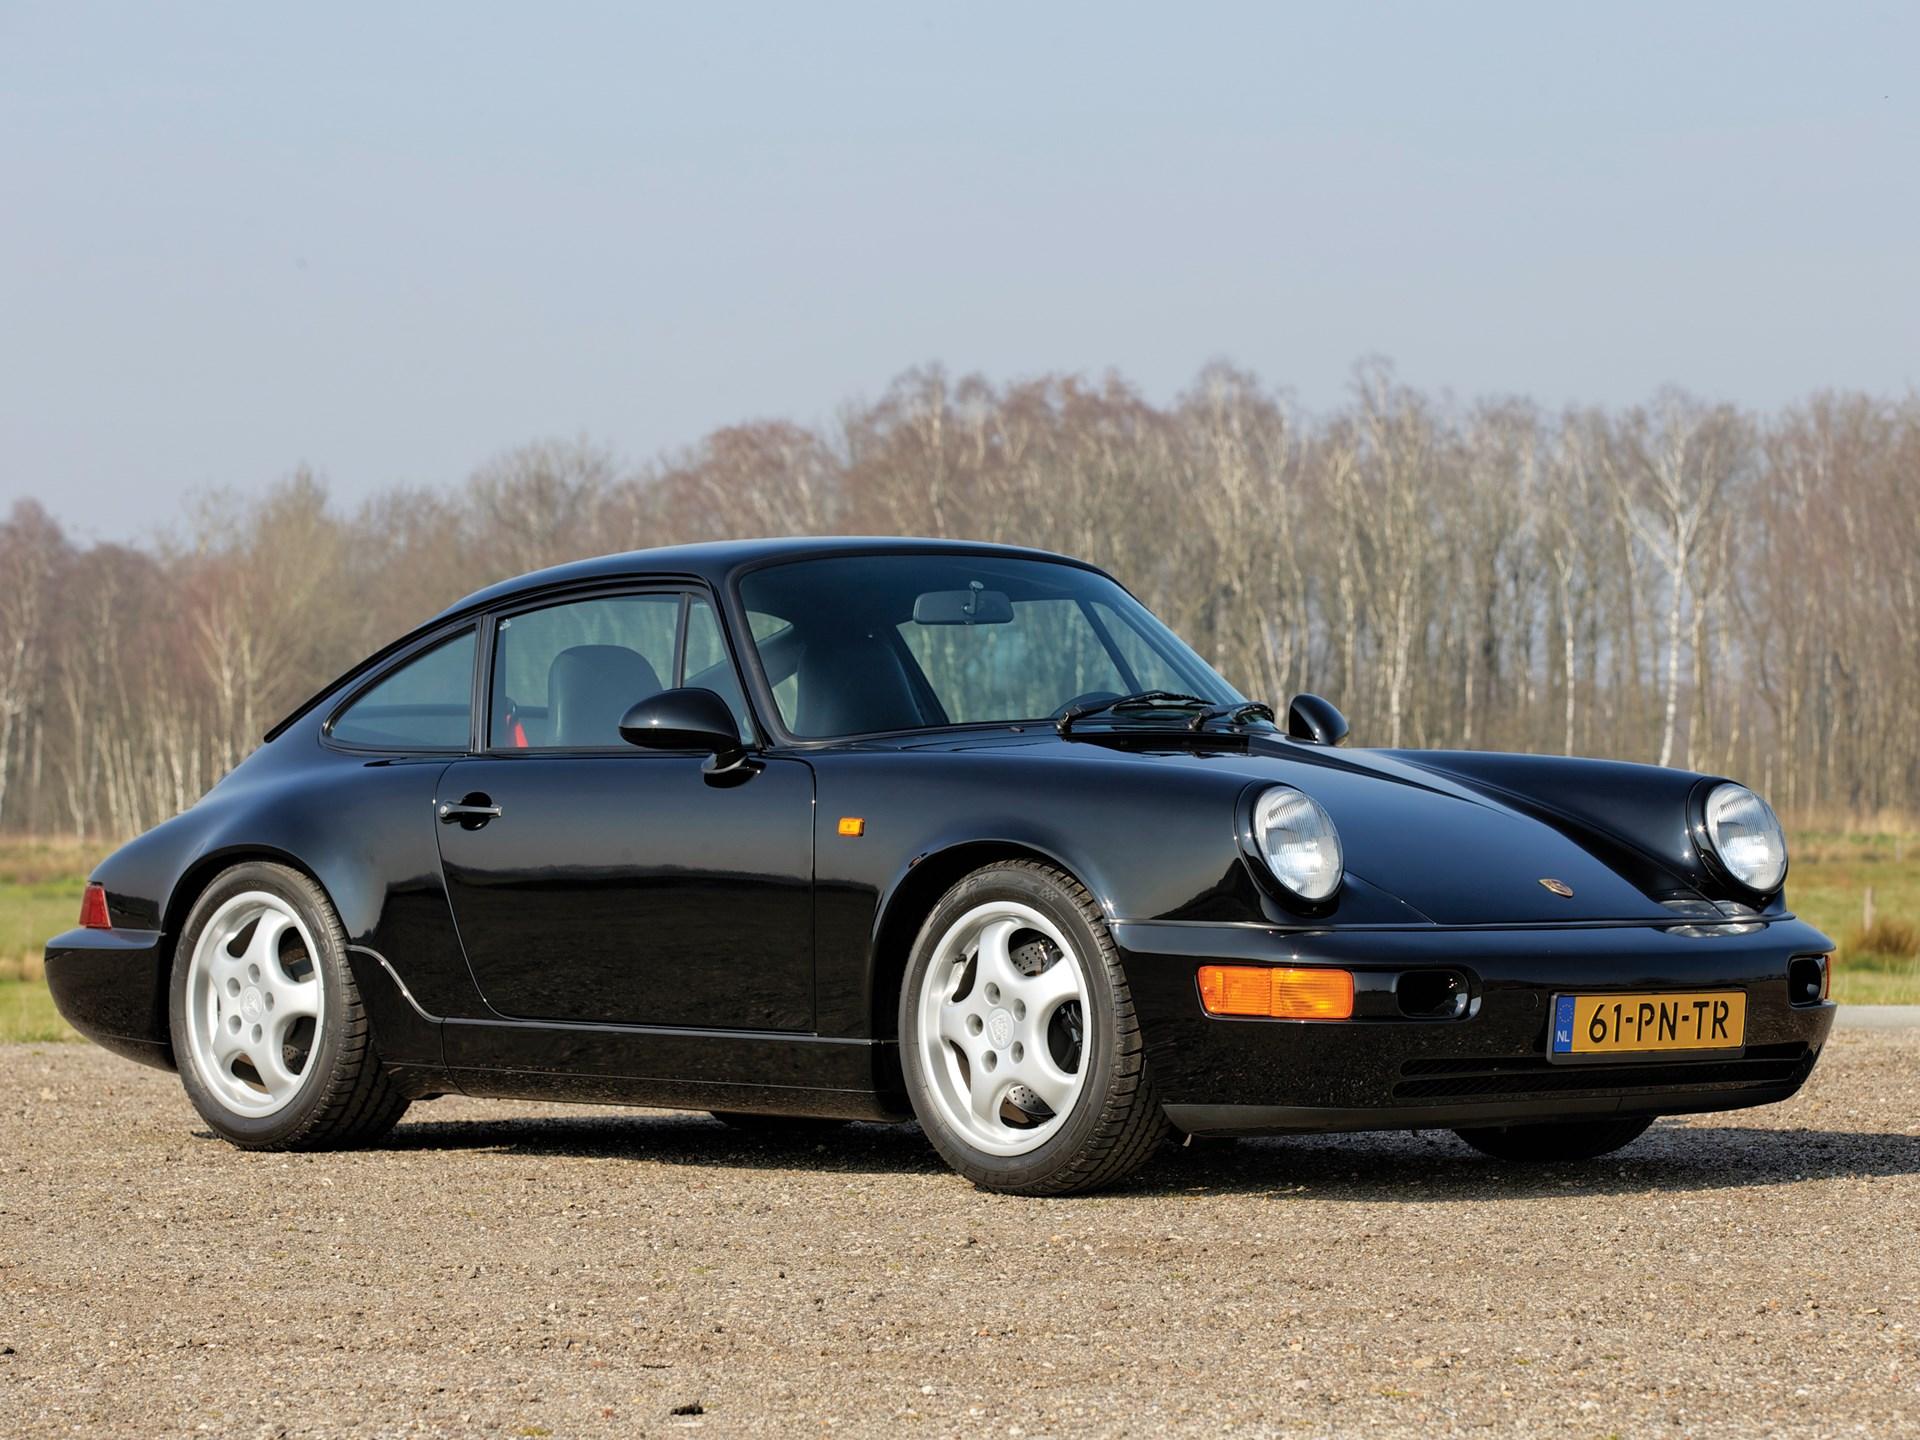 1992 Porsche 911 Carrera RS 3.6